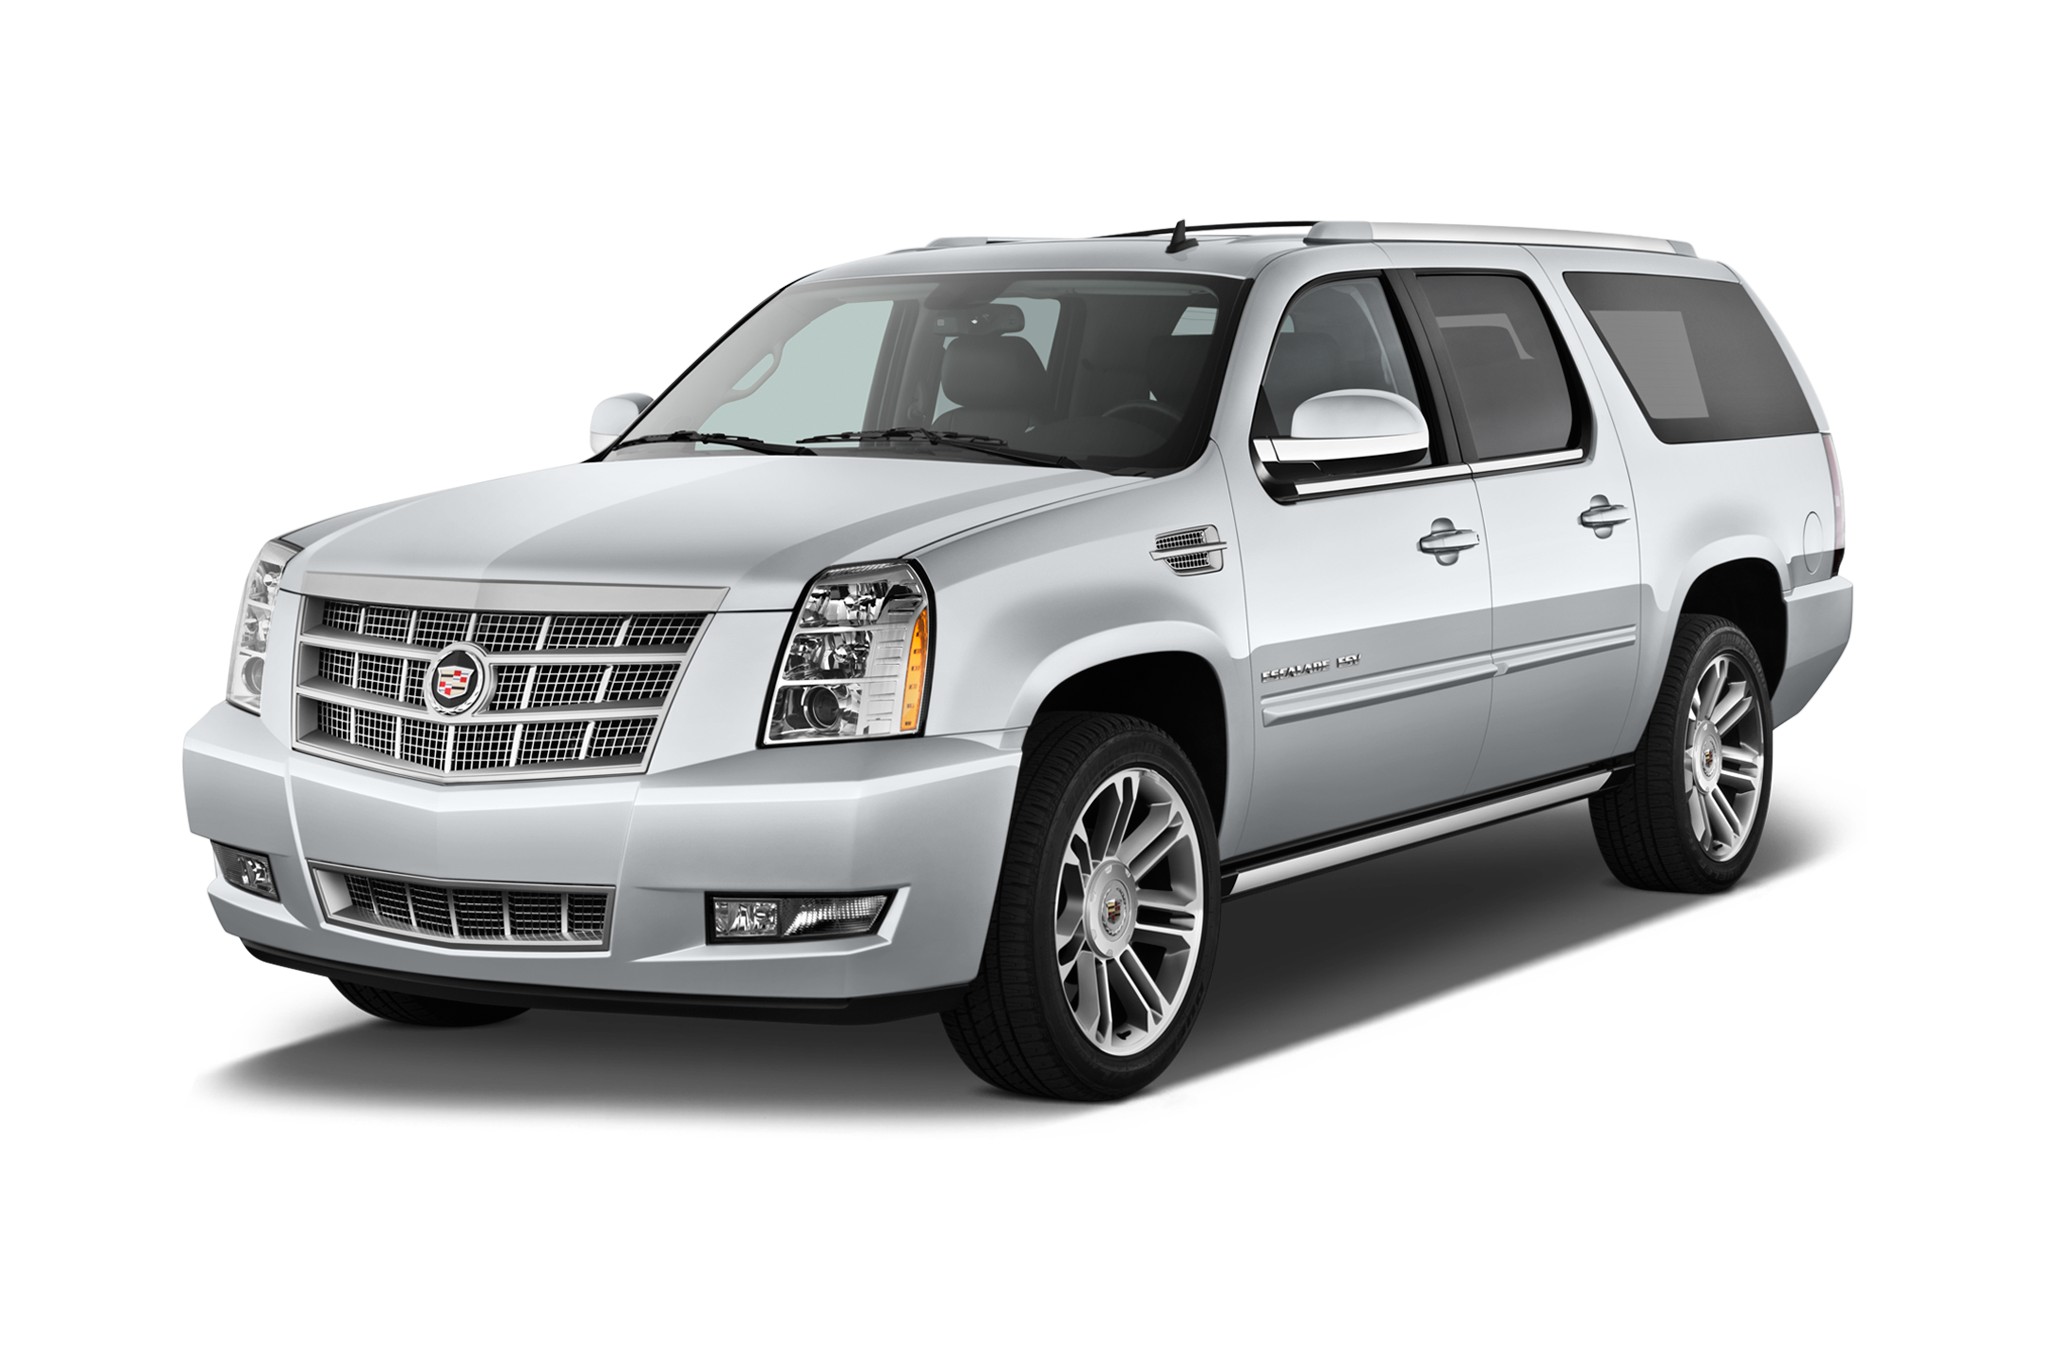 2012 Cadillac Escalade ESV Platinum - Editors' Notebook - Automobile Magazine